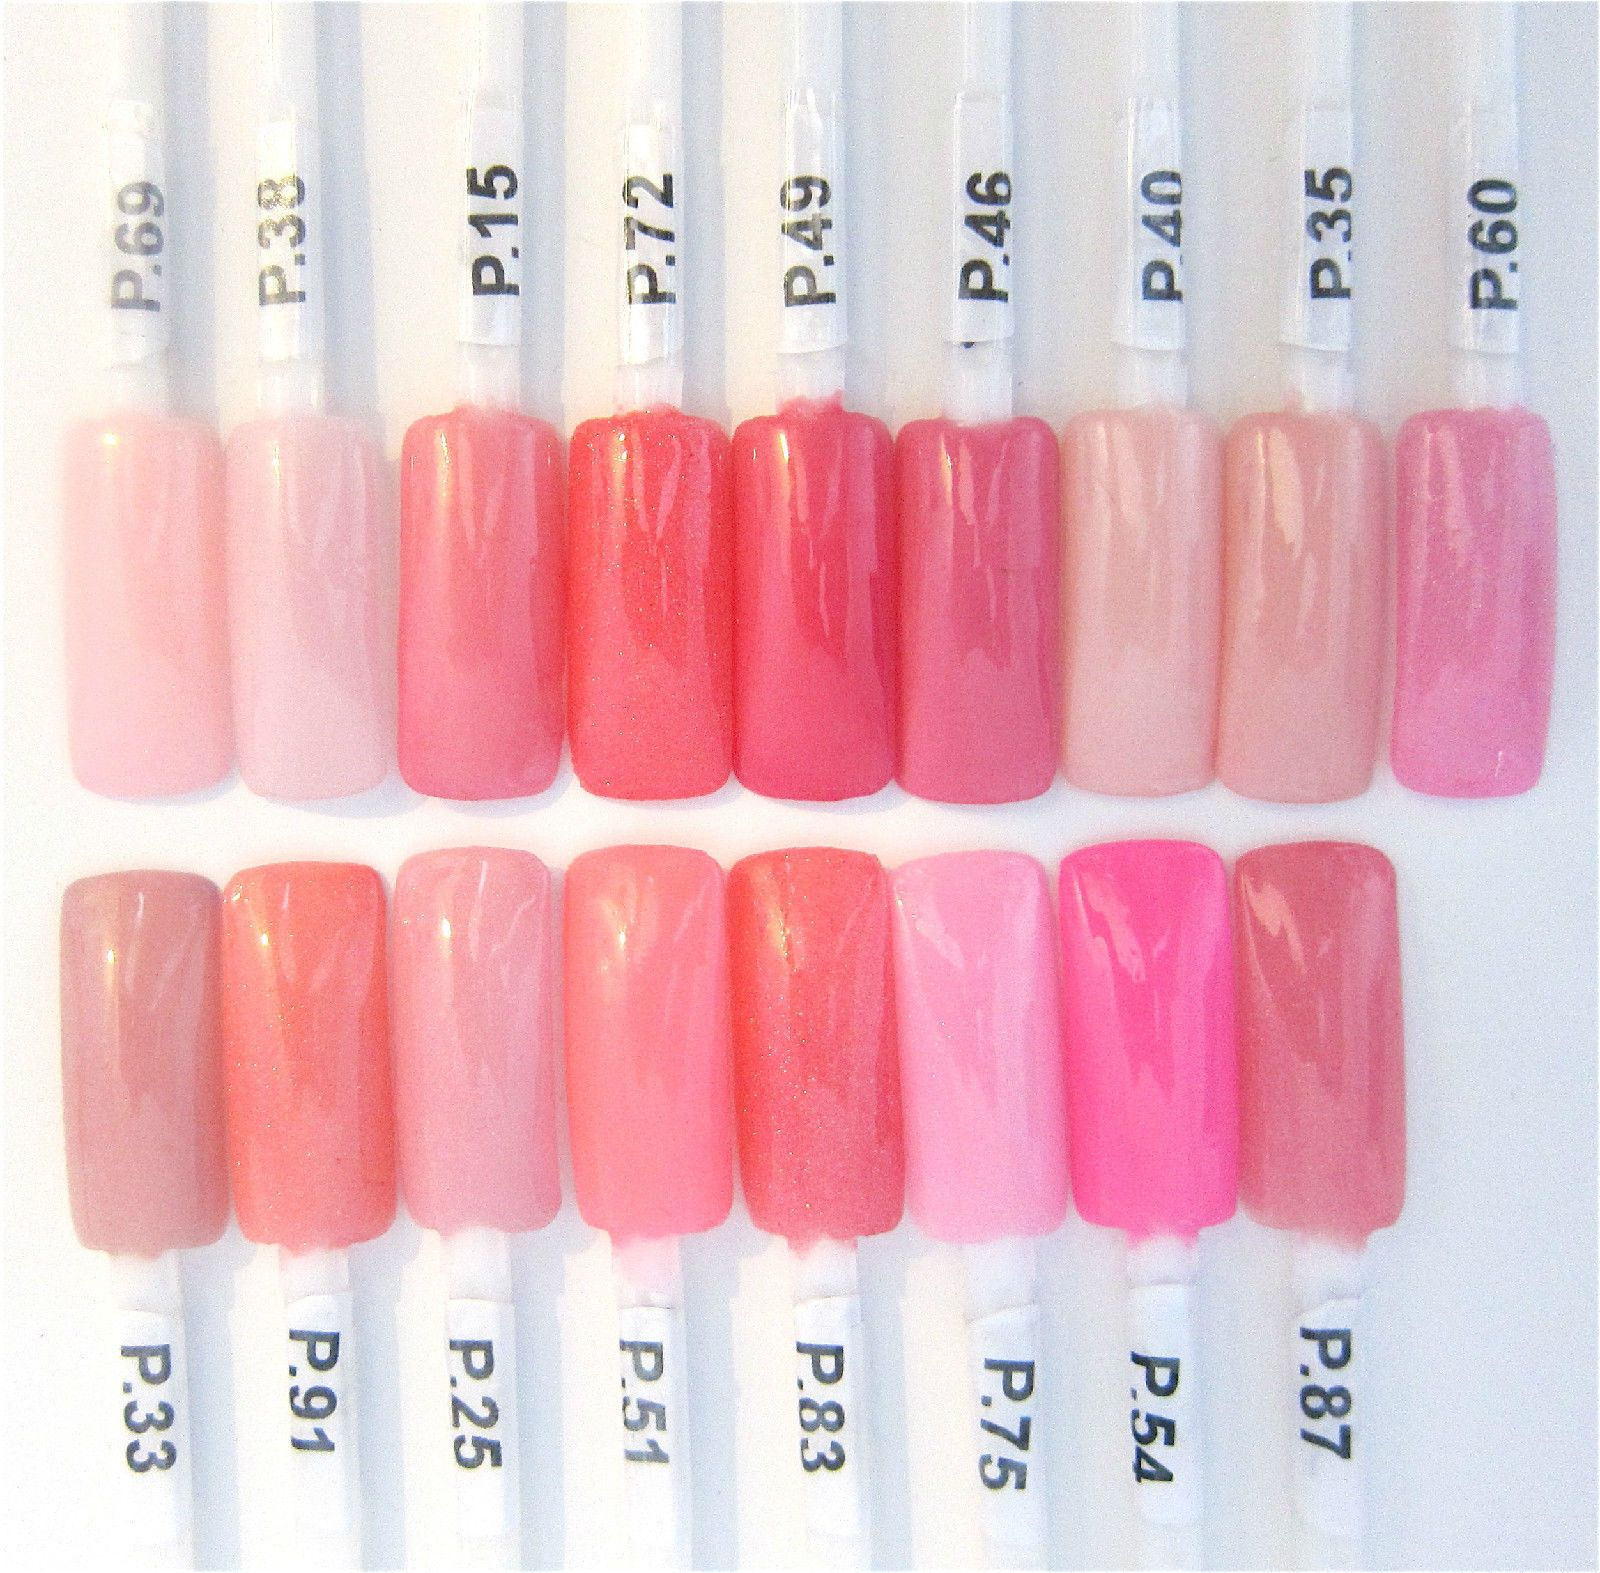 1000 Images About Nails On Pinterest Jars Colors And Powder Nexgen Nails Colors Dip Nail Colors Nail Colors